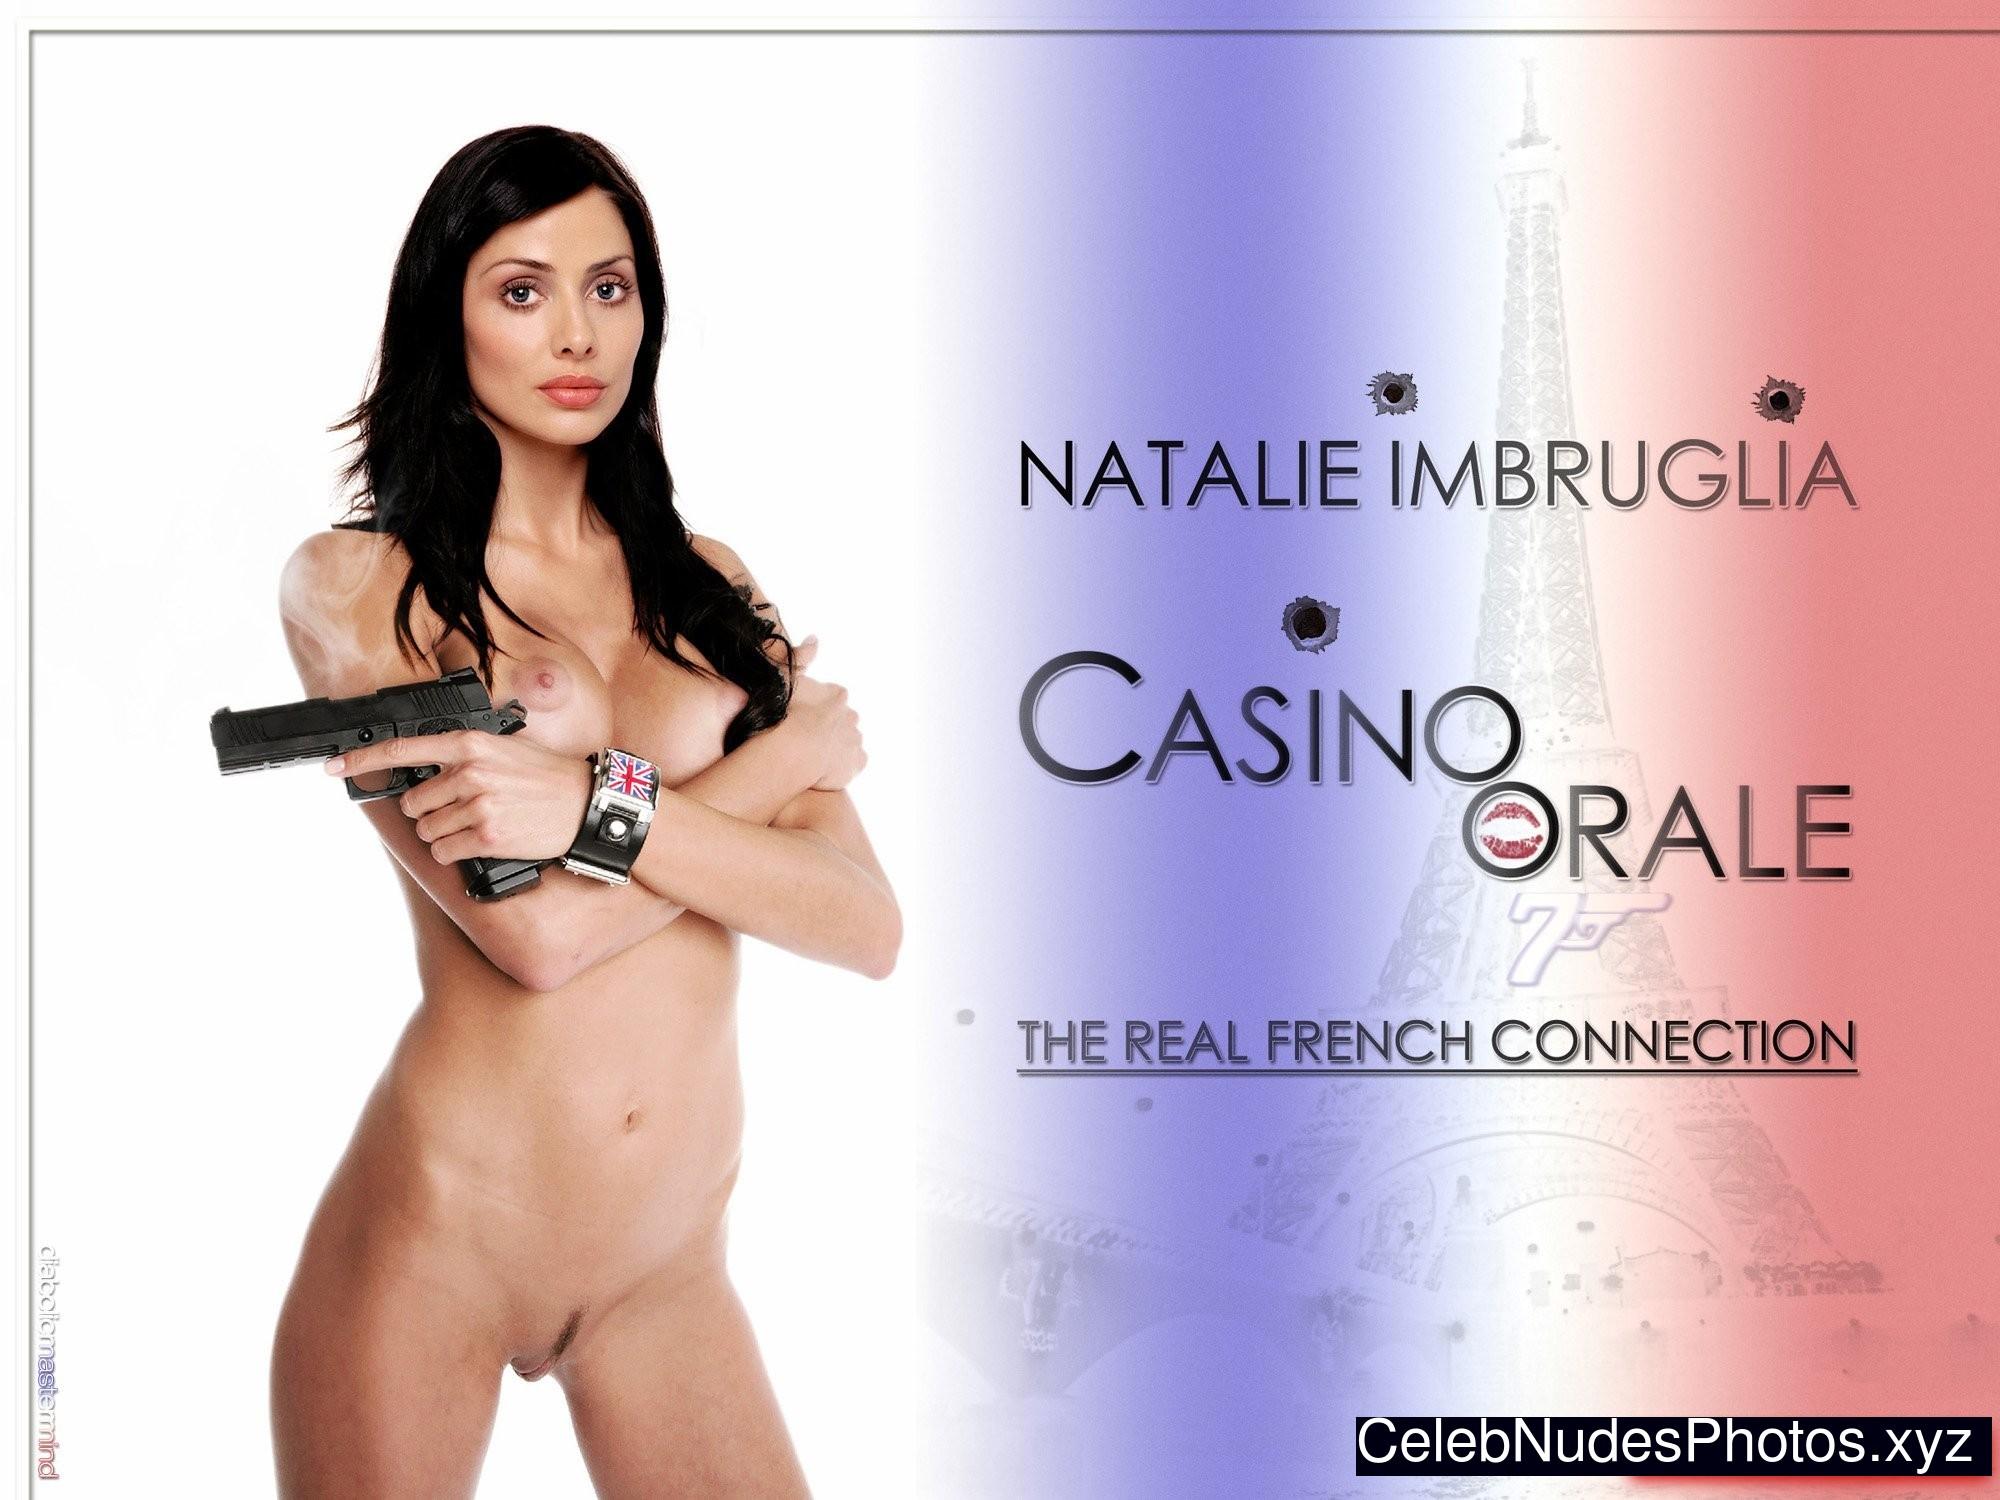 Natalie Imbruglia nude celeb